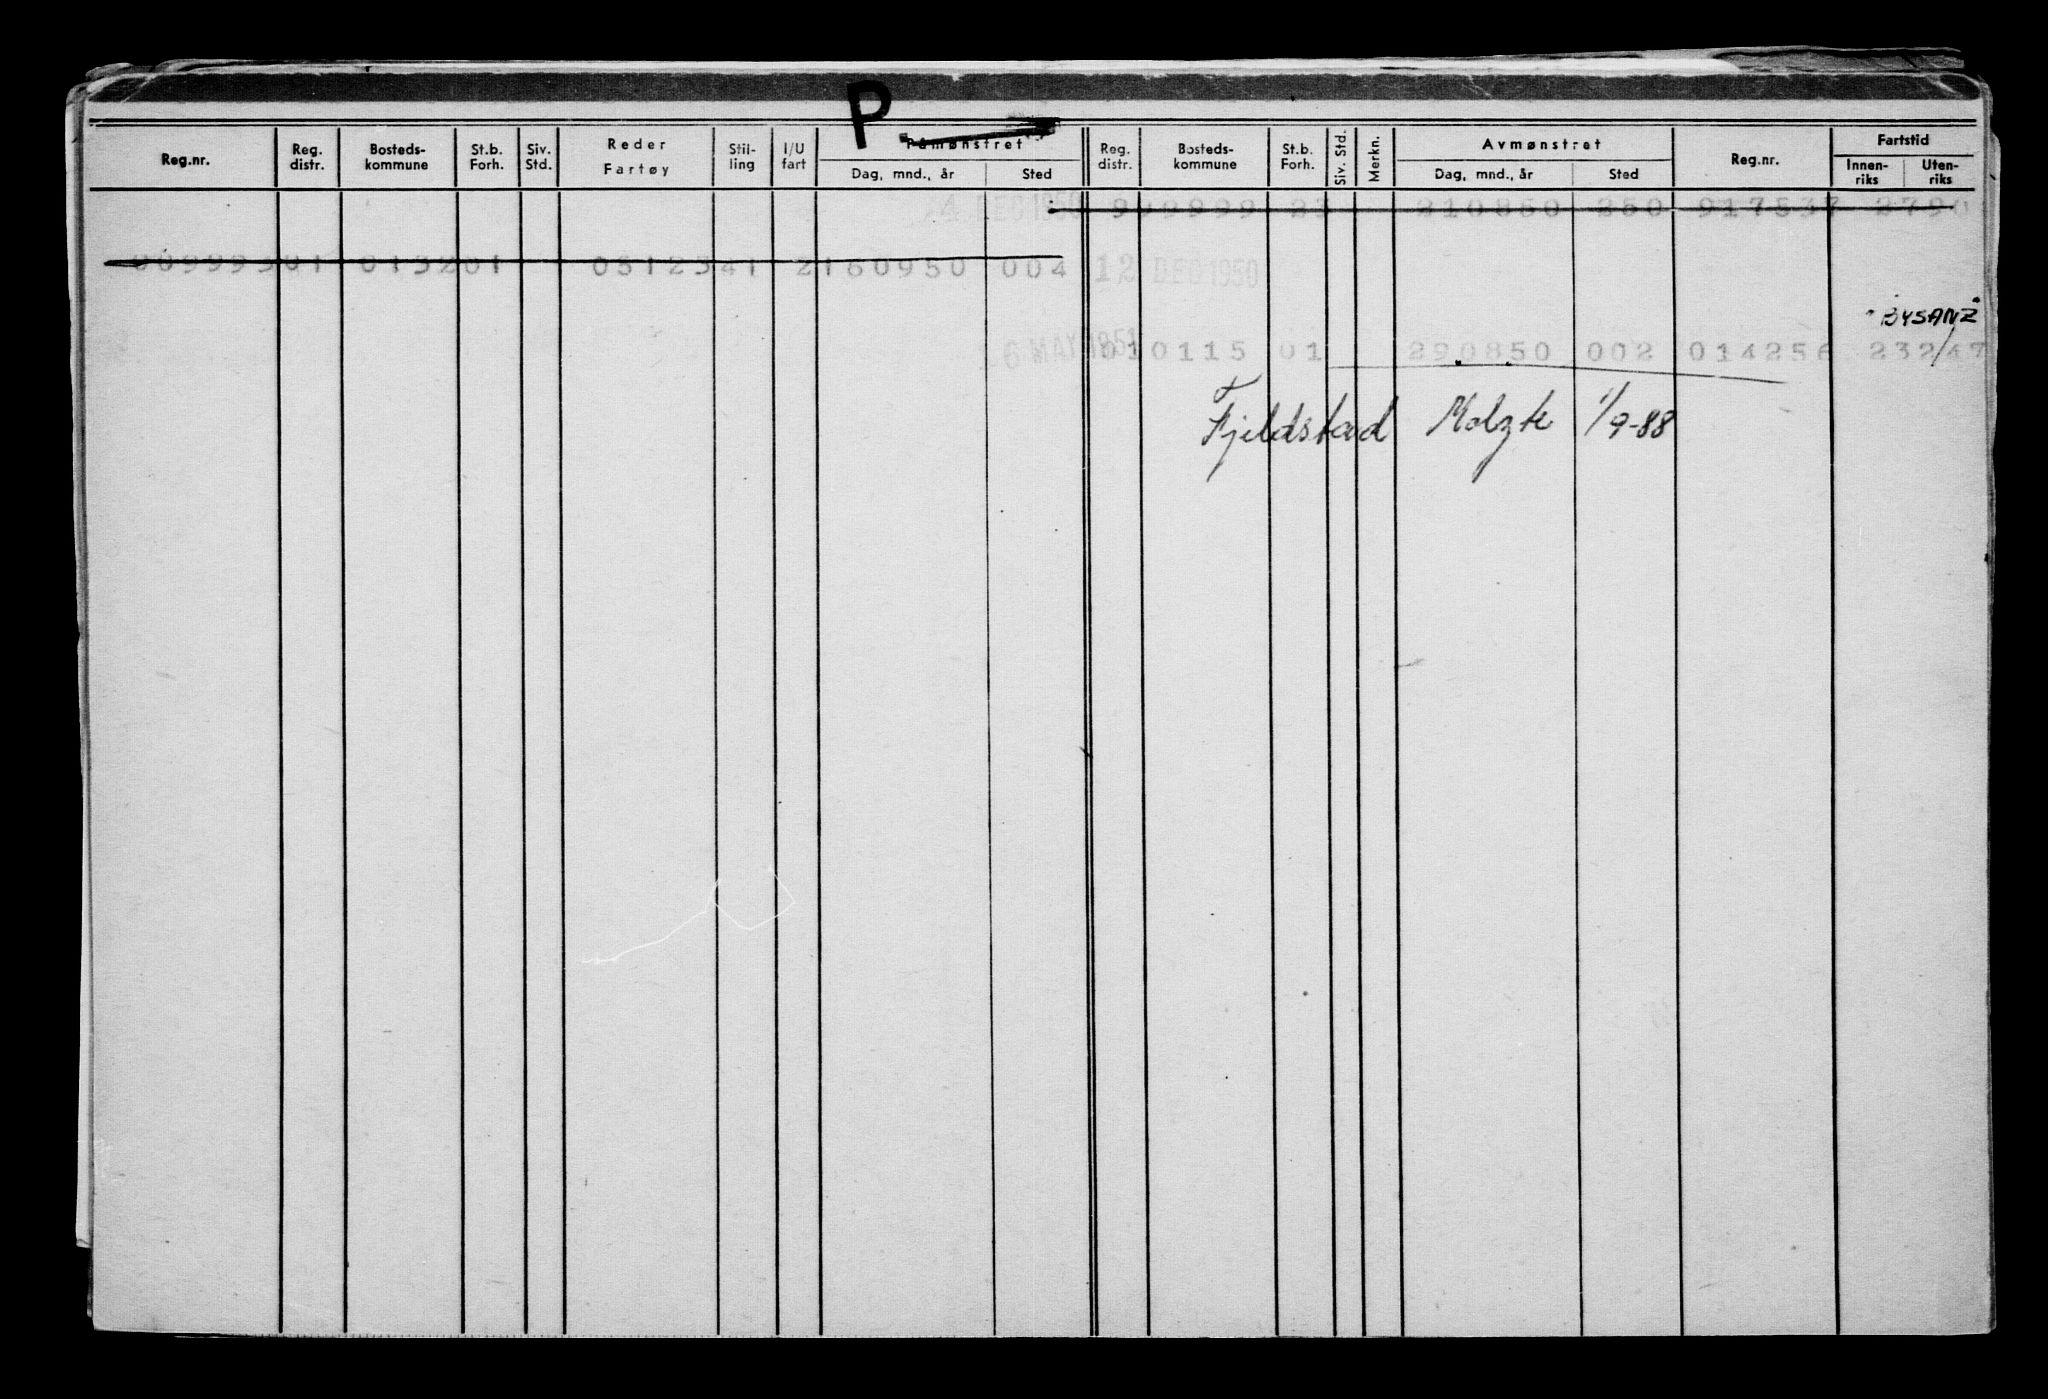 RA, Direktoratet for sjømenn, G/Gb/L0005: Hovedkort, 1888, s. 369